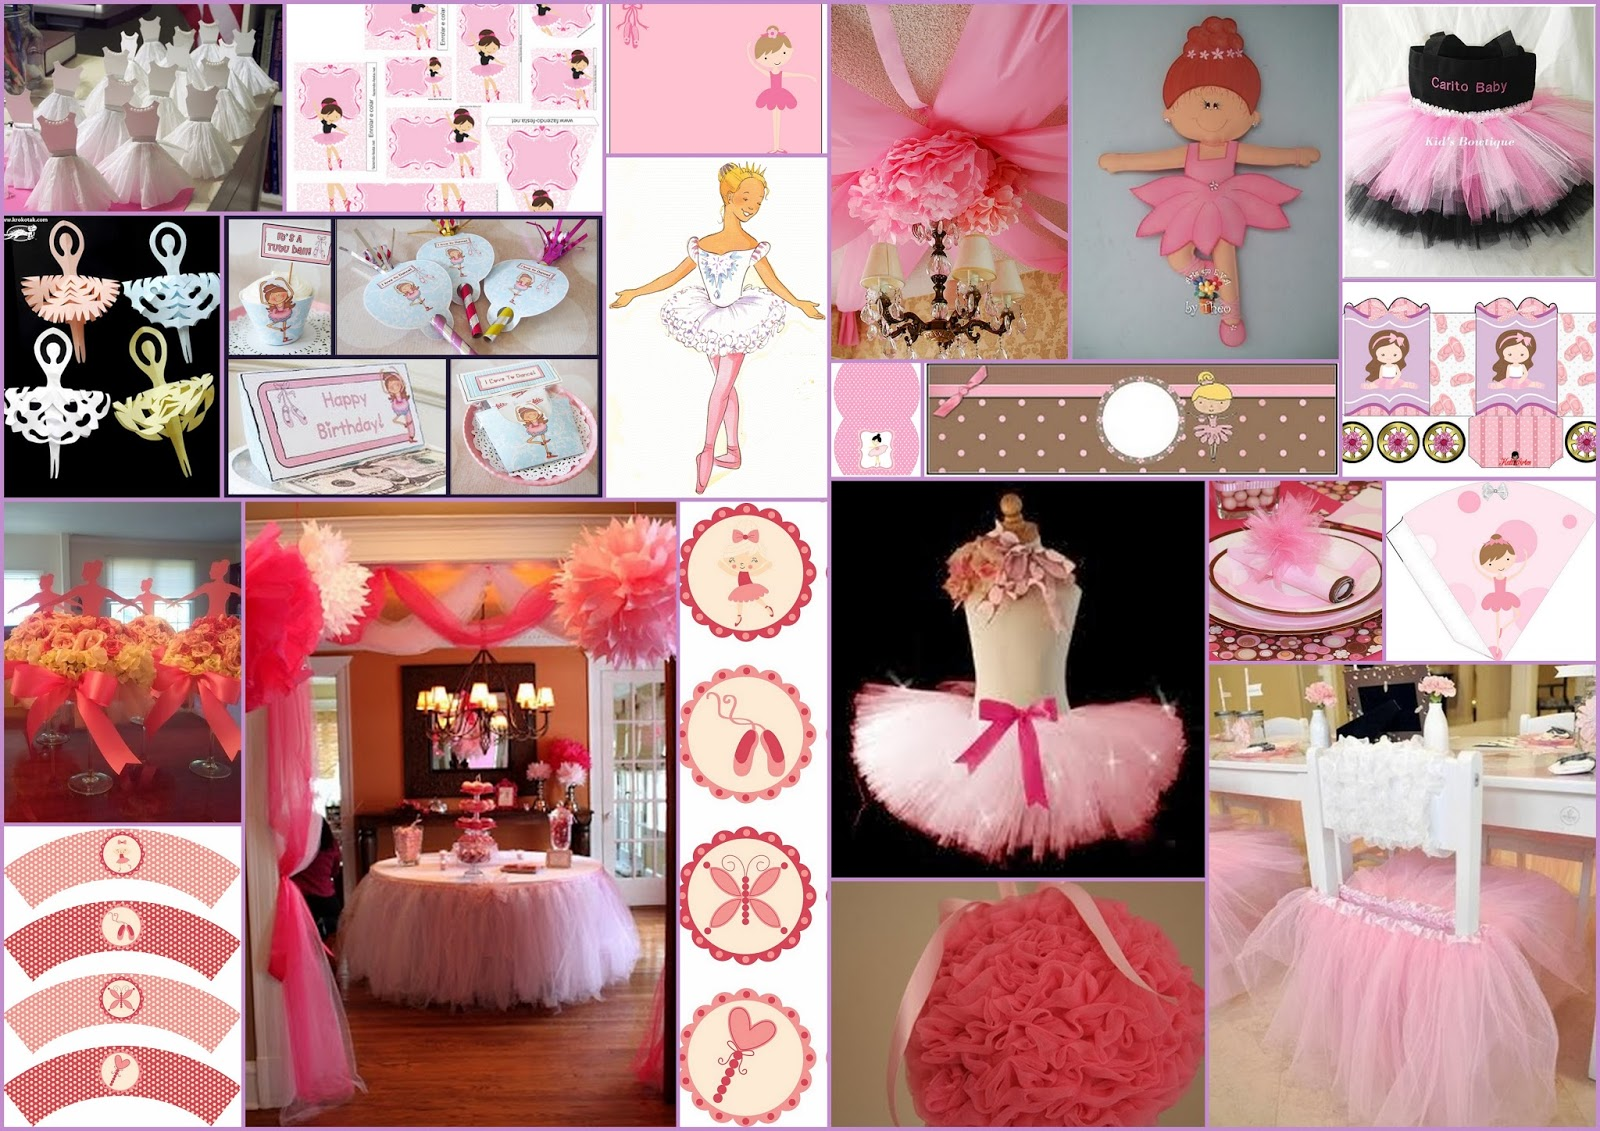 Ballet Quinceanera Party DIYs, Free Printables, Party